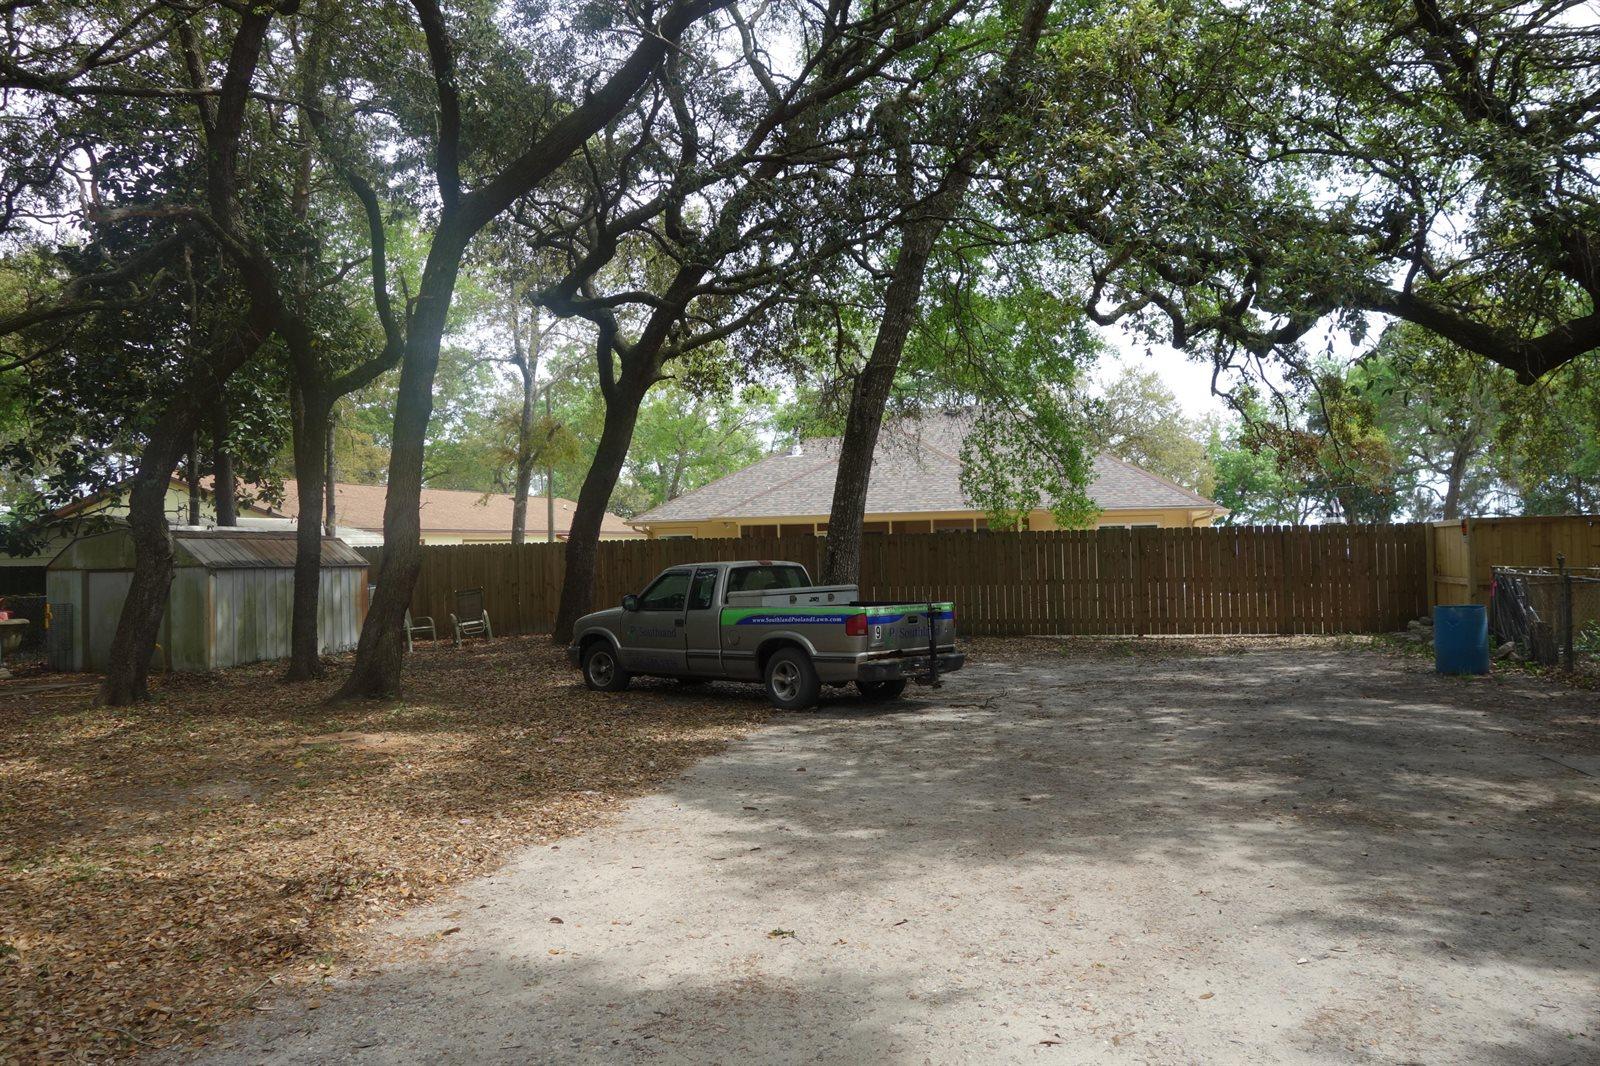 86 Live Oak Street, Niceville, FL 32578